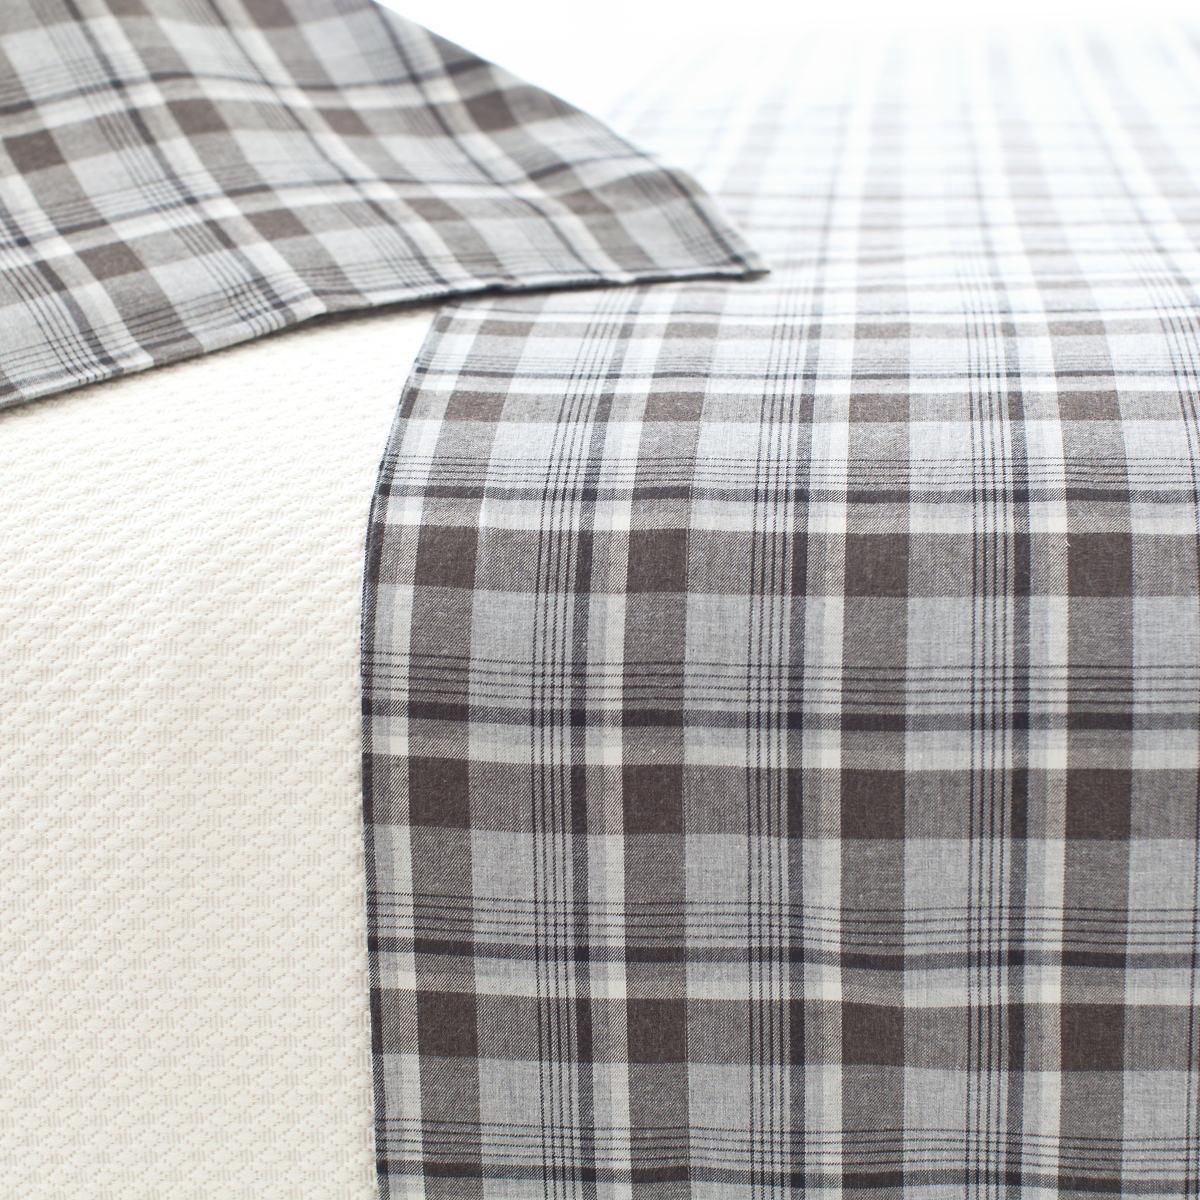 Greyville Tartan Pillowcases (Pair)